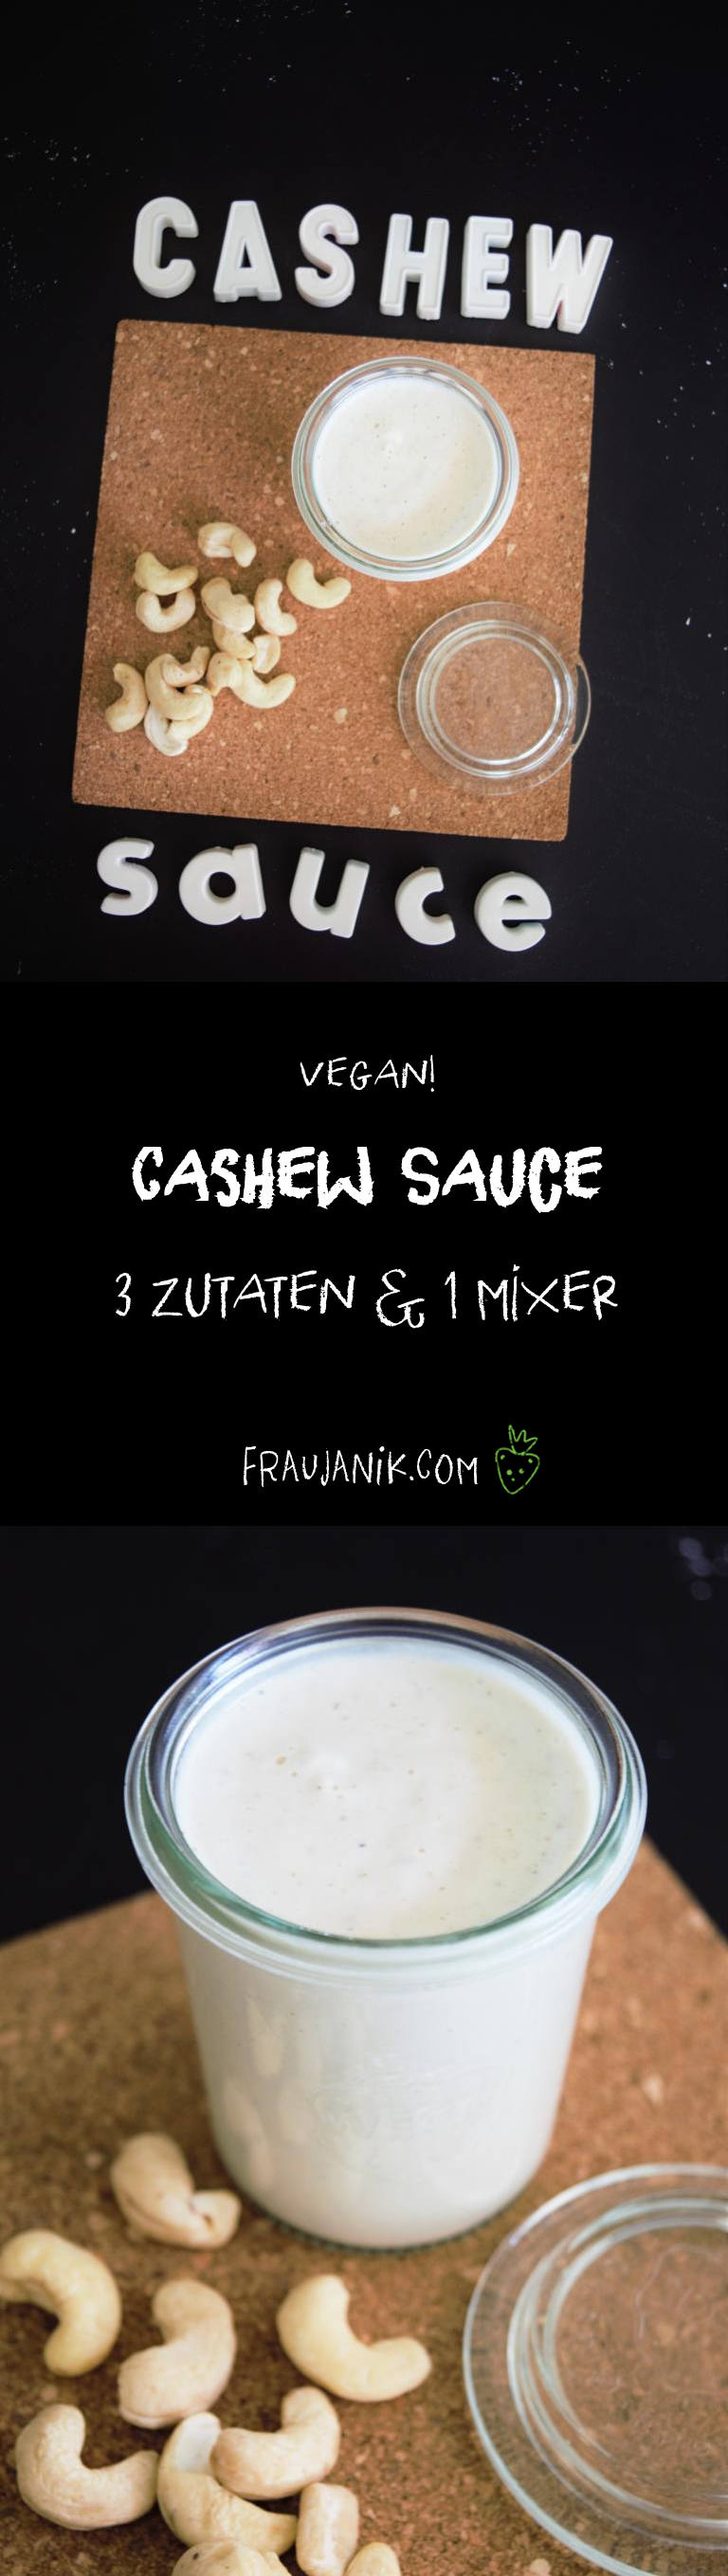 Cashew Sauce